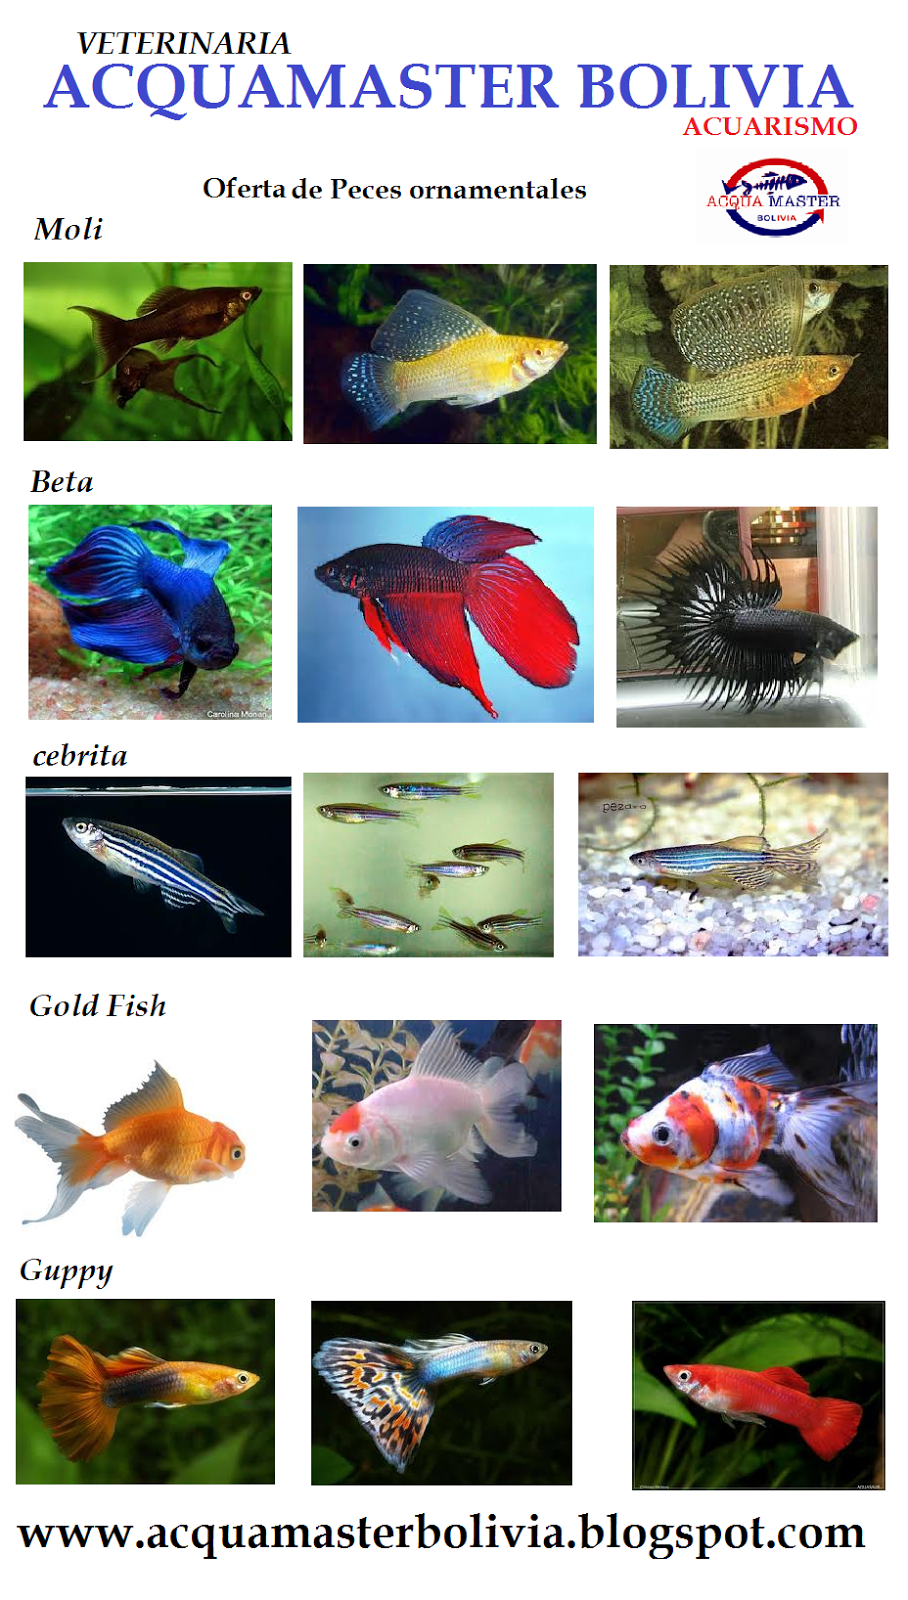 Empresa veterinaria acquamaster bolivia peces ornamentales for Manual de peces ornamentales